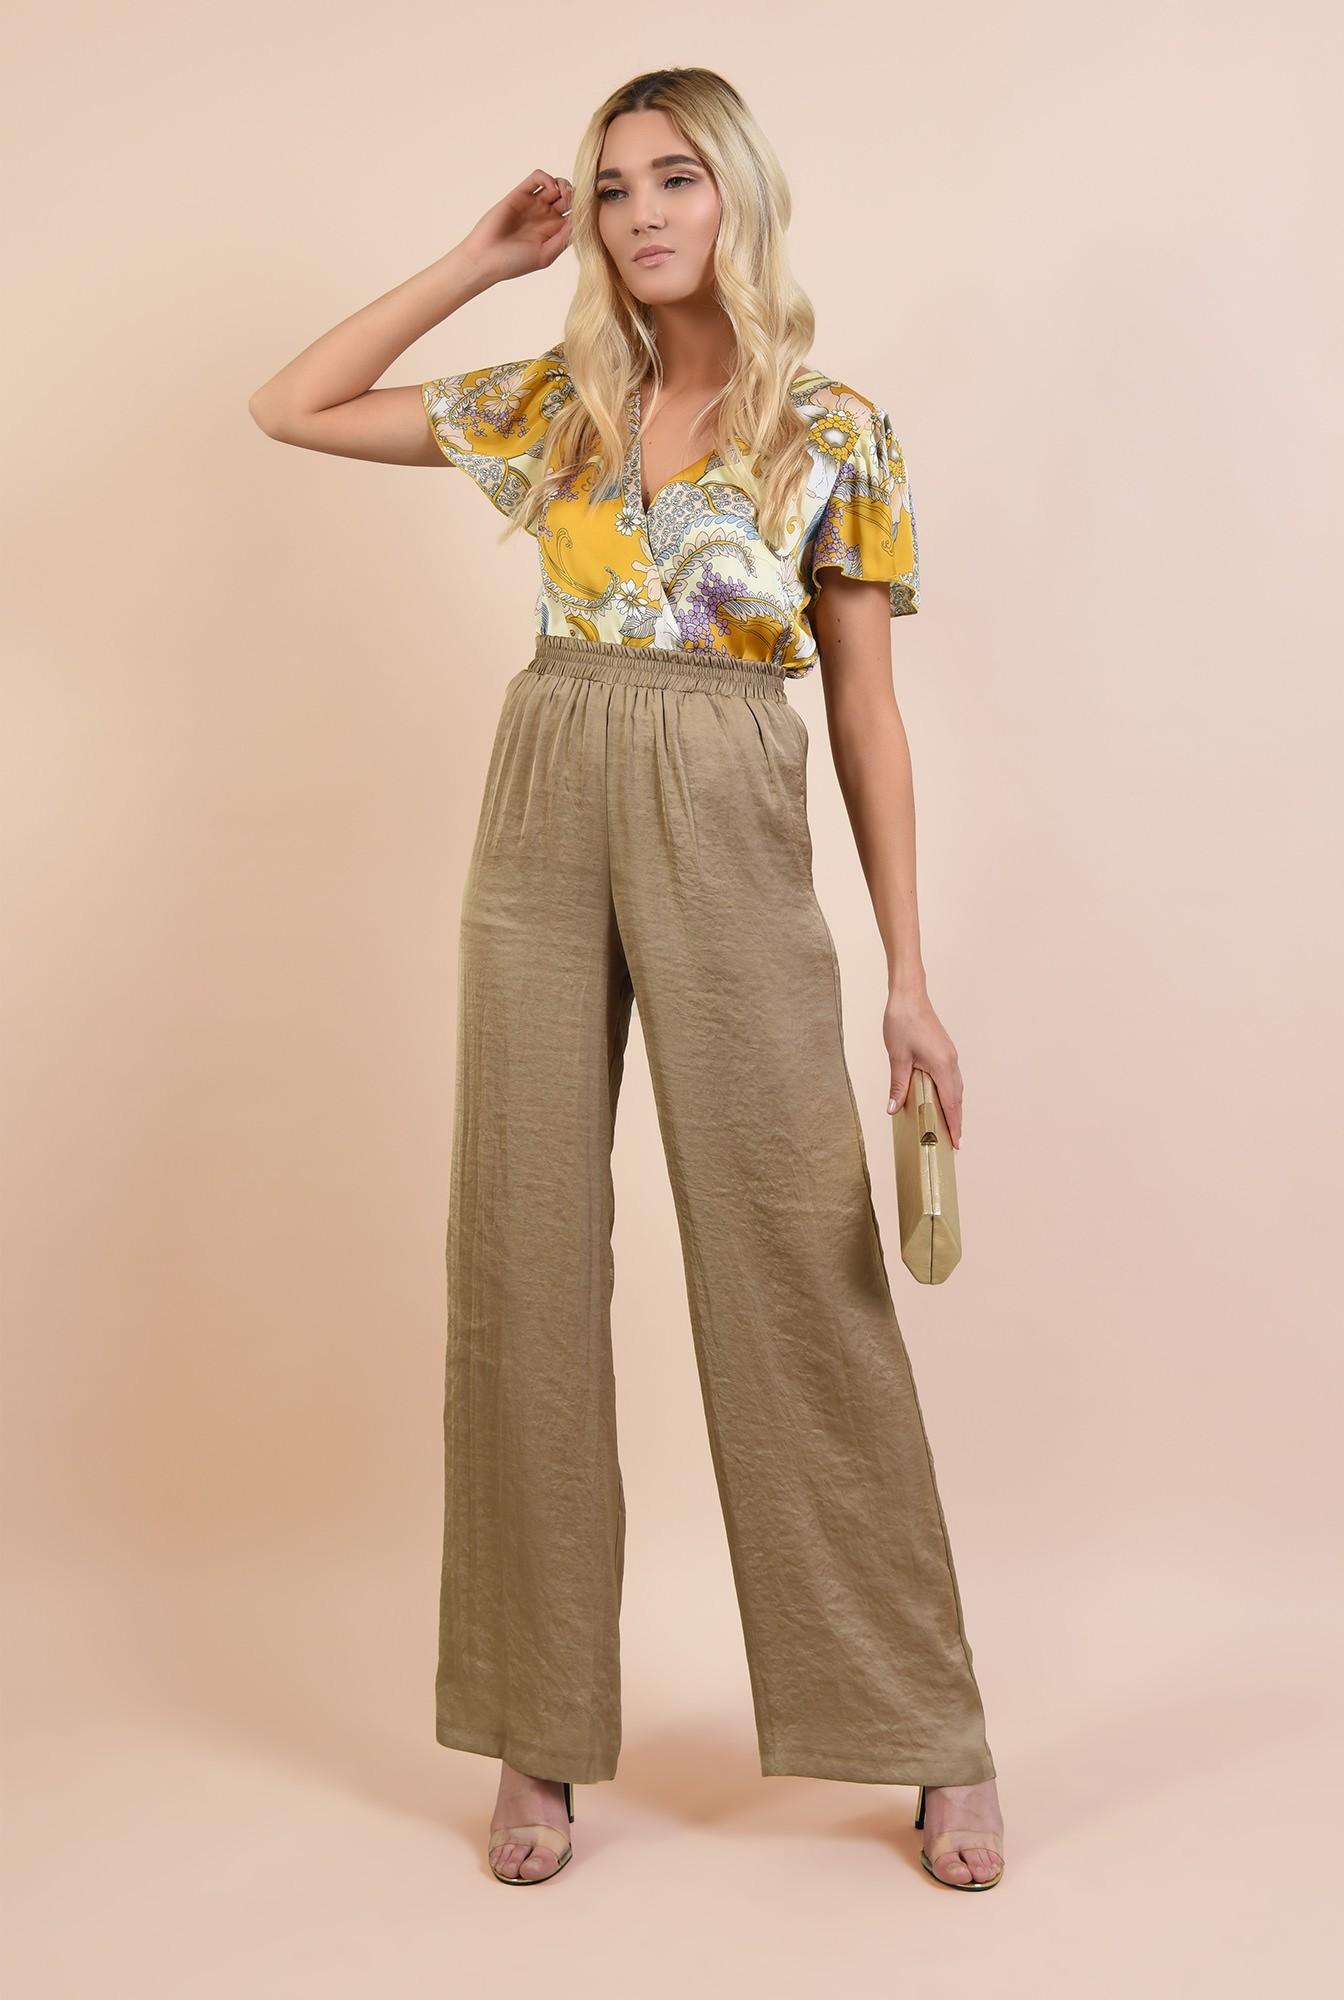 3 - bluza eleganta, din satin, cu imprimeu floral, croi lejer parte peste parte